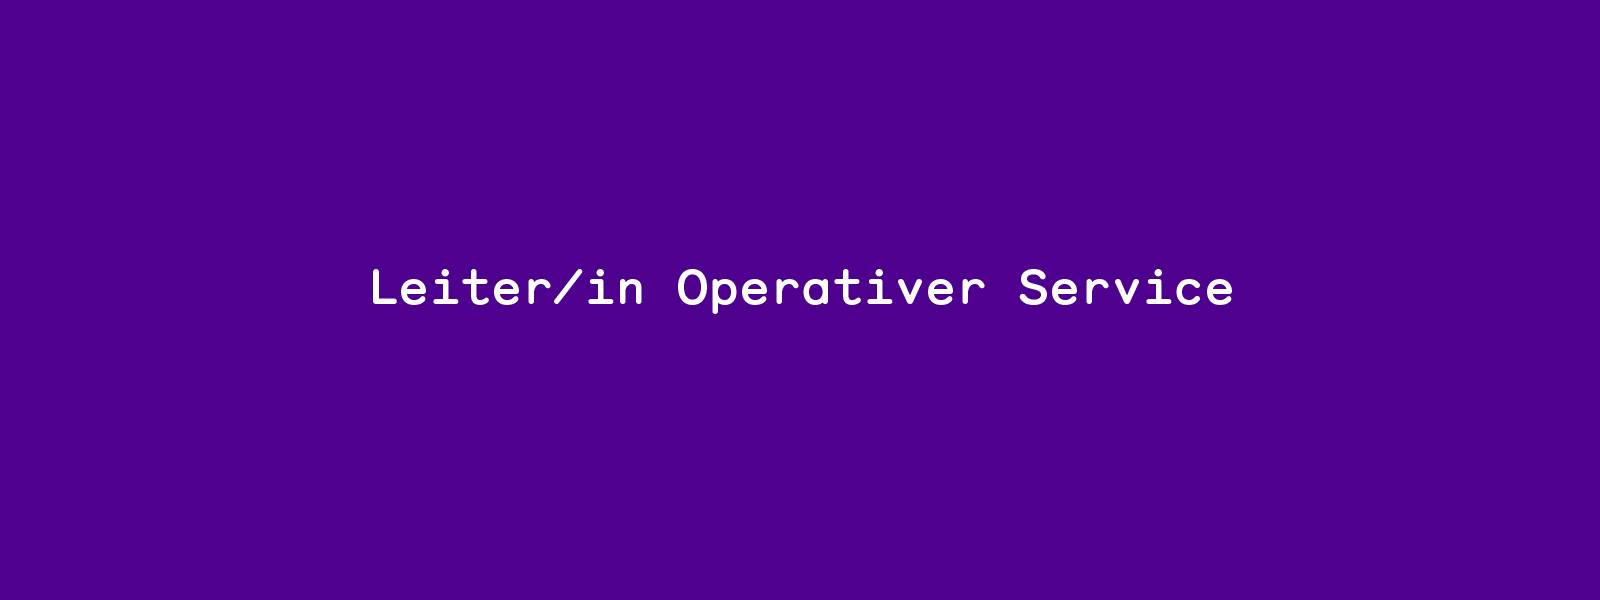 Leiter_Operativer_Service